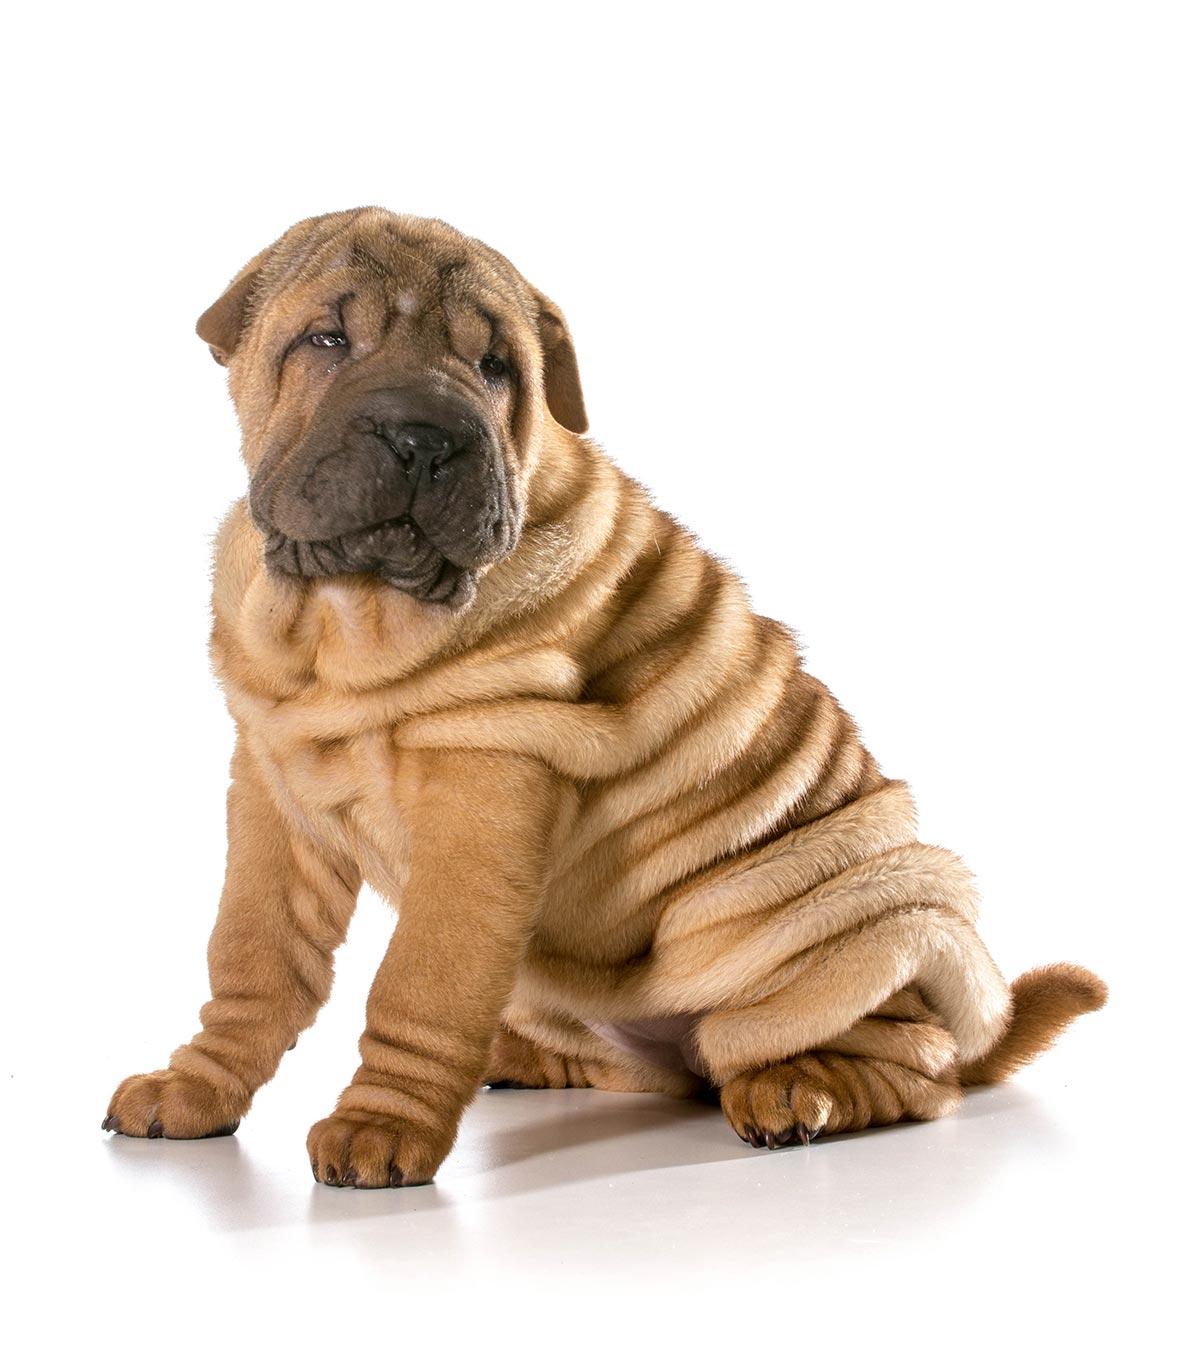 Shar-pei puppy, Cooley Dickinson Medical Group Plastic Surgery, Northampton, MA 01060.